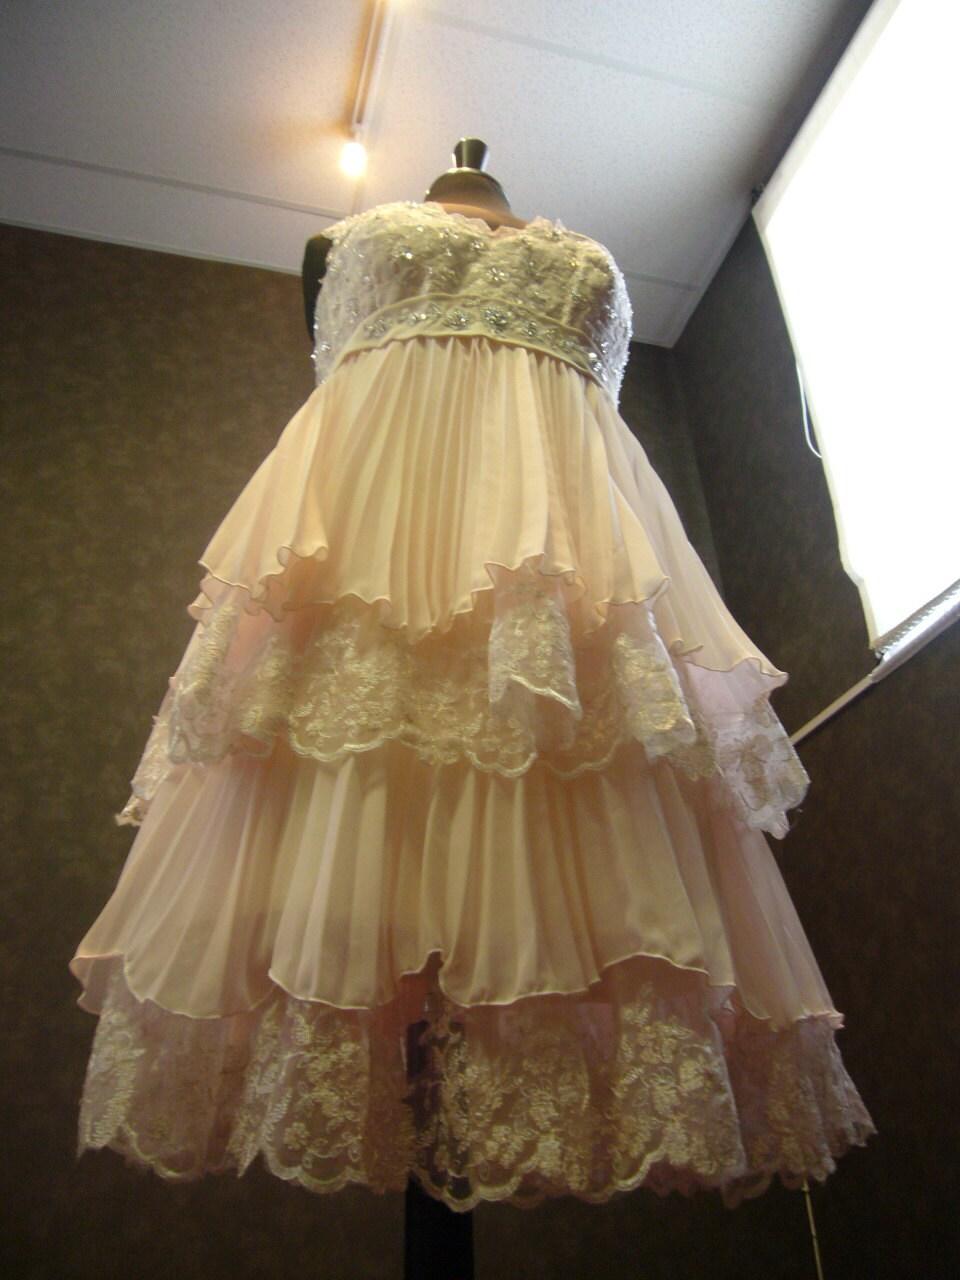 Blush Pink Plus Size Bridesmaid Dresses : Blush pink plus size wedding dress with by weddingdressfantasy